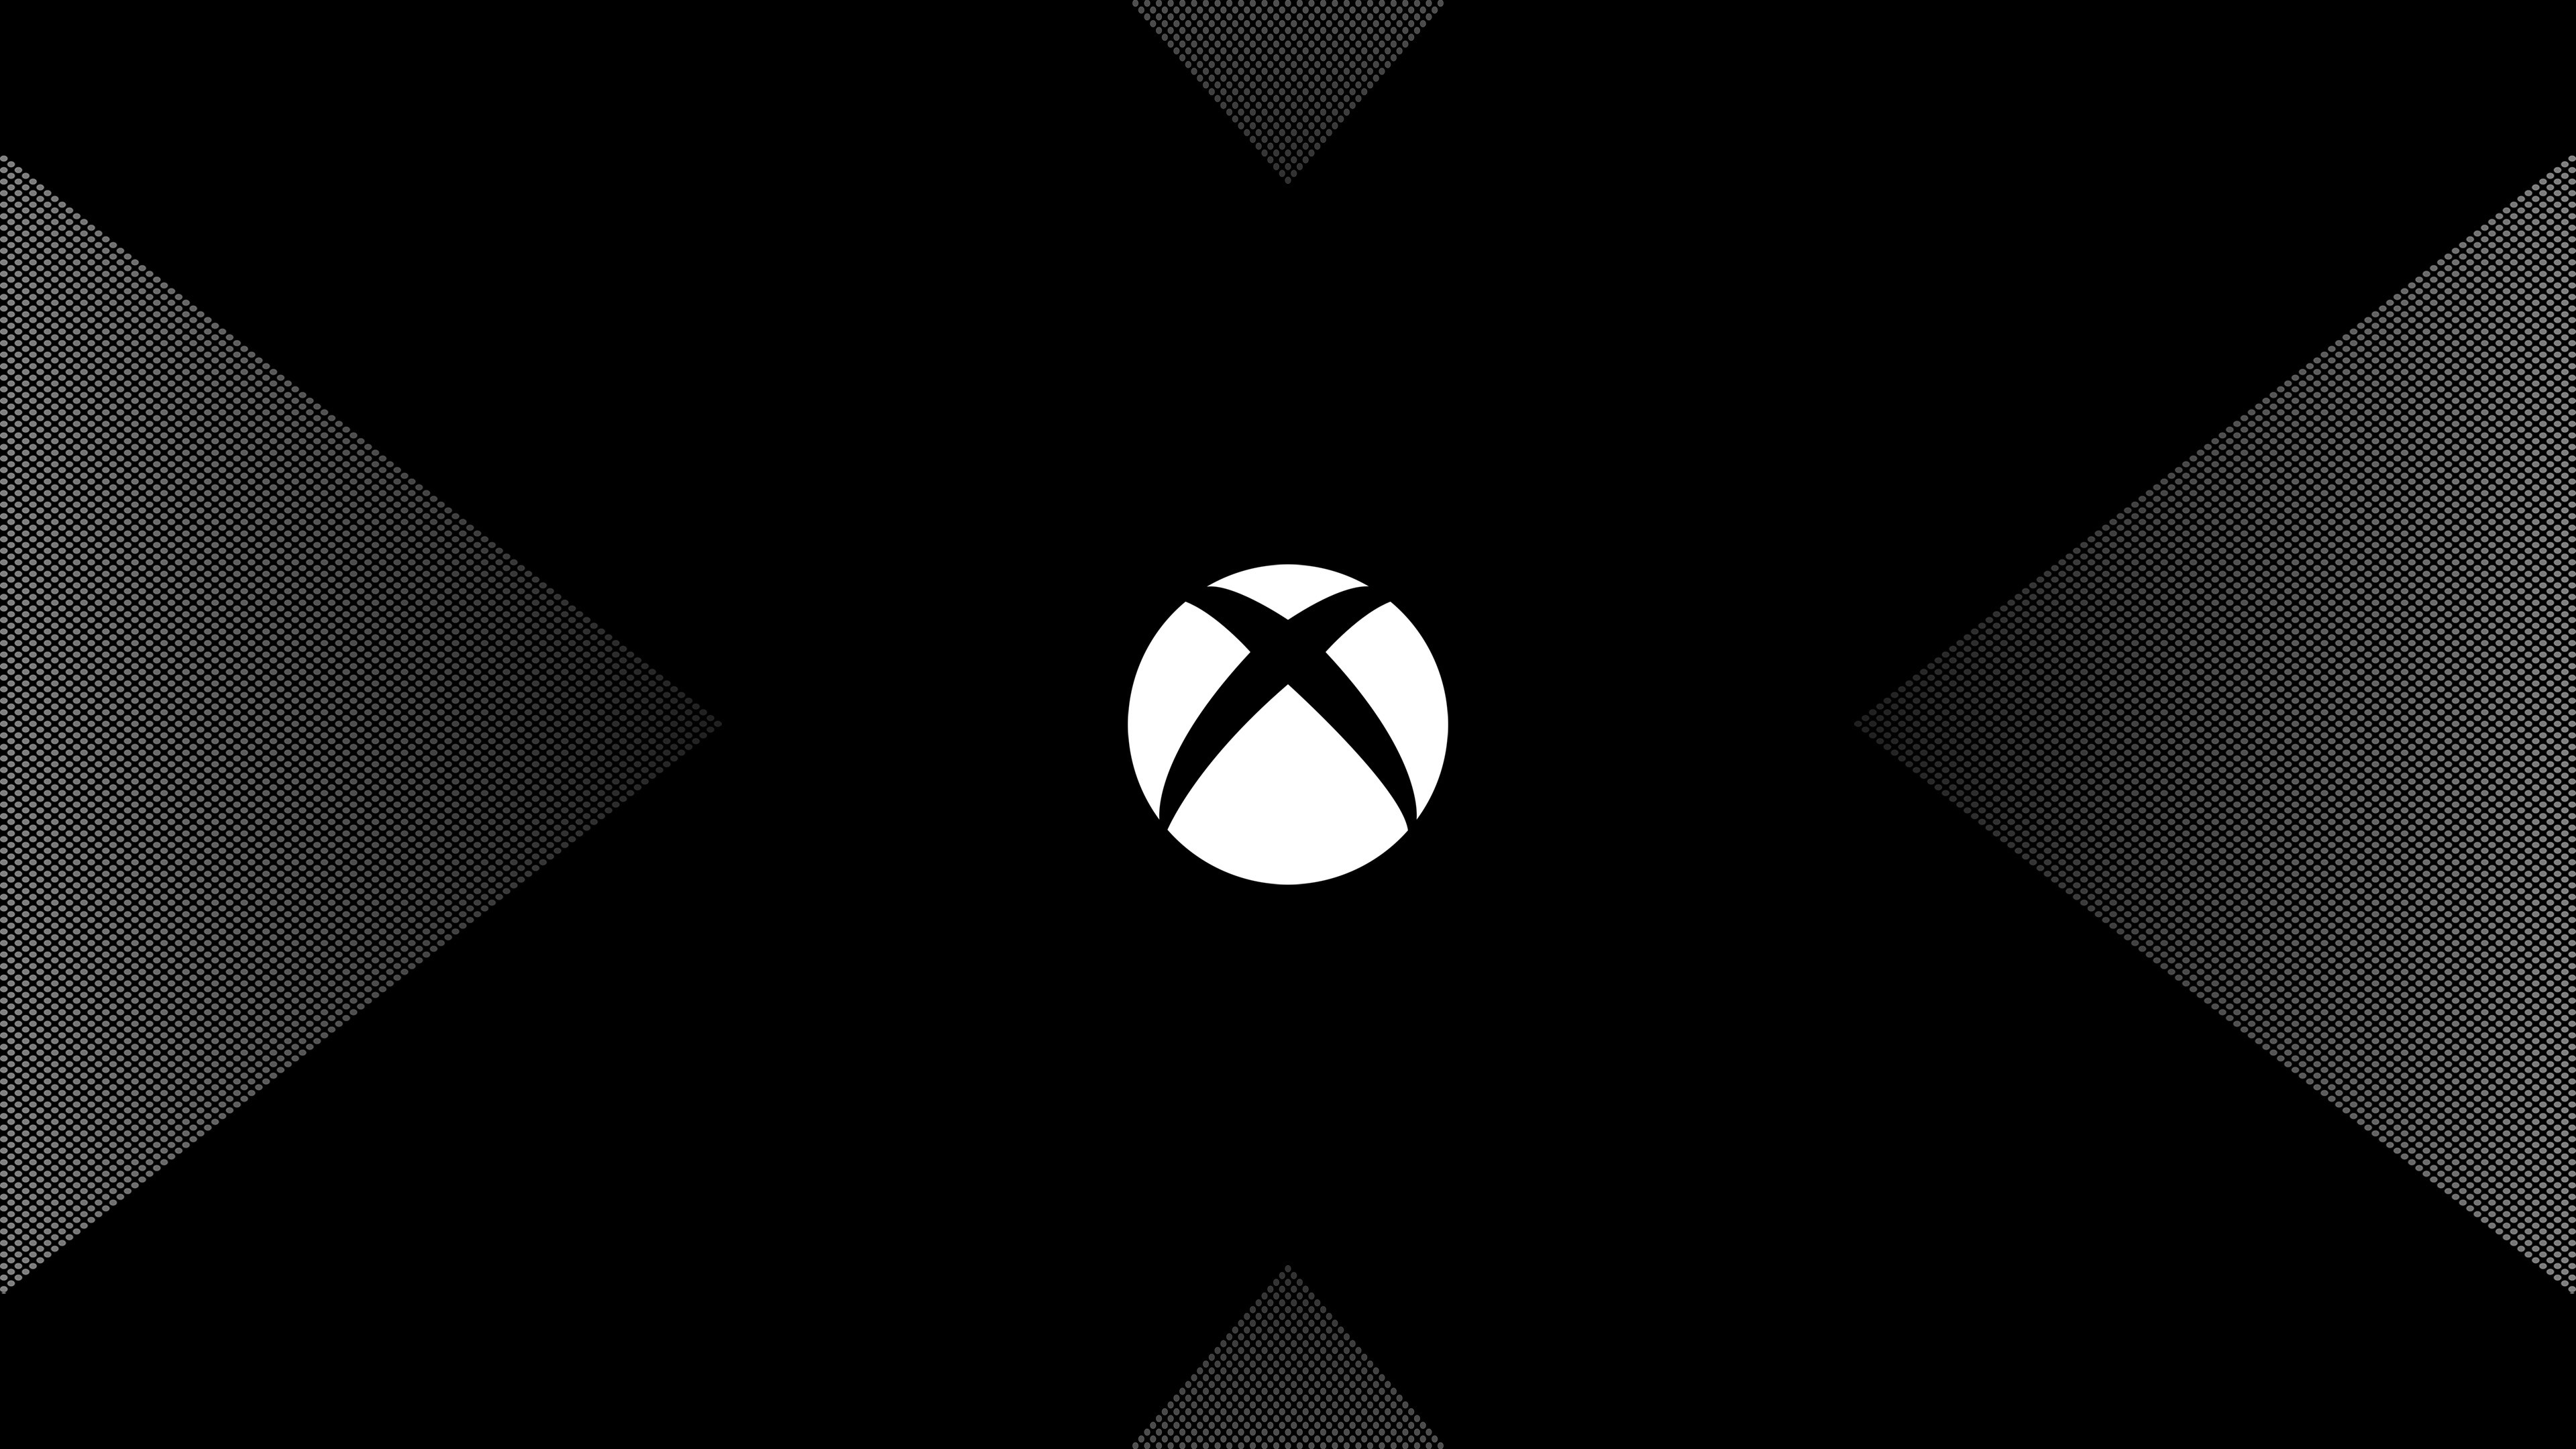 xbox 360 logo wallpaper (69+ images)